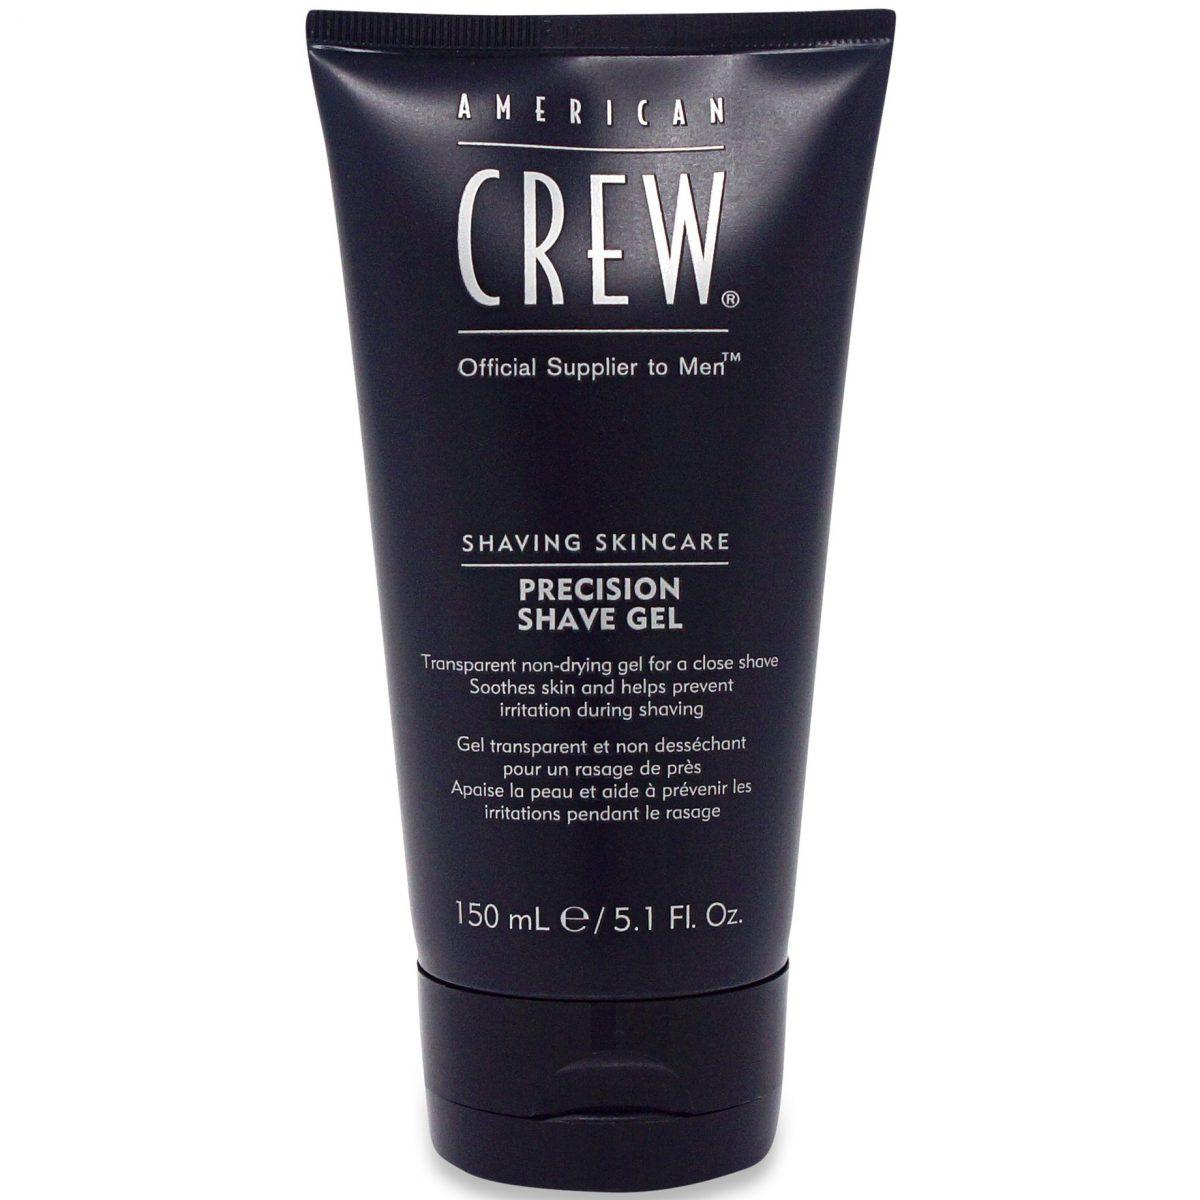 02_Emphase_American-Crew-precision-shave-gel_150ml.jpg